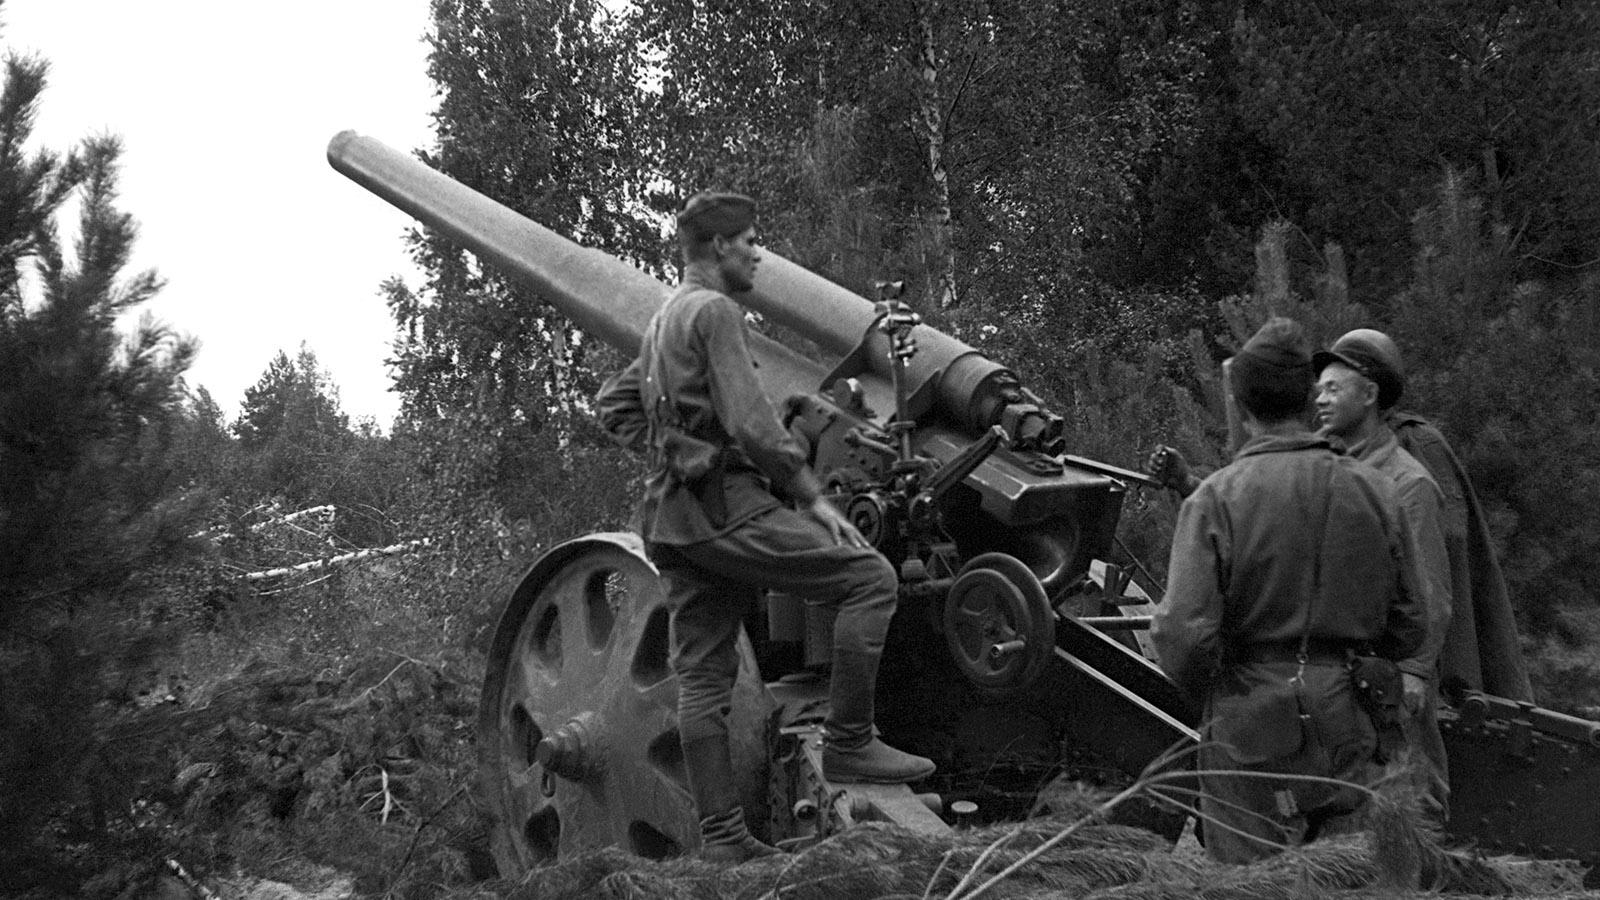 Картинка артиллерия времен вов